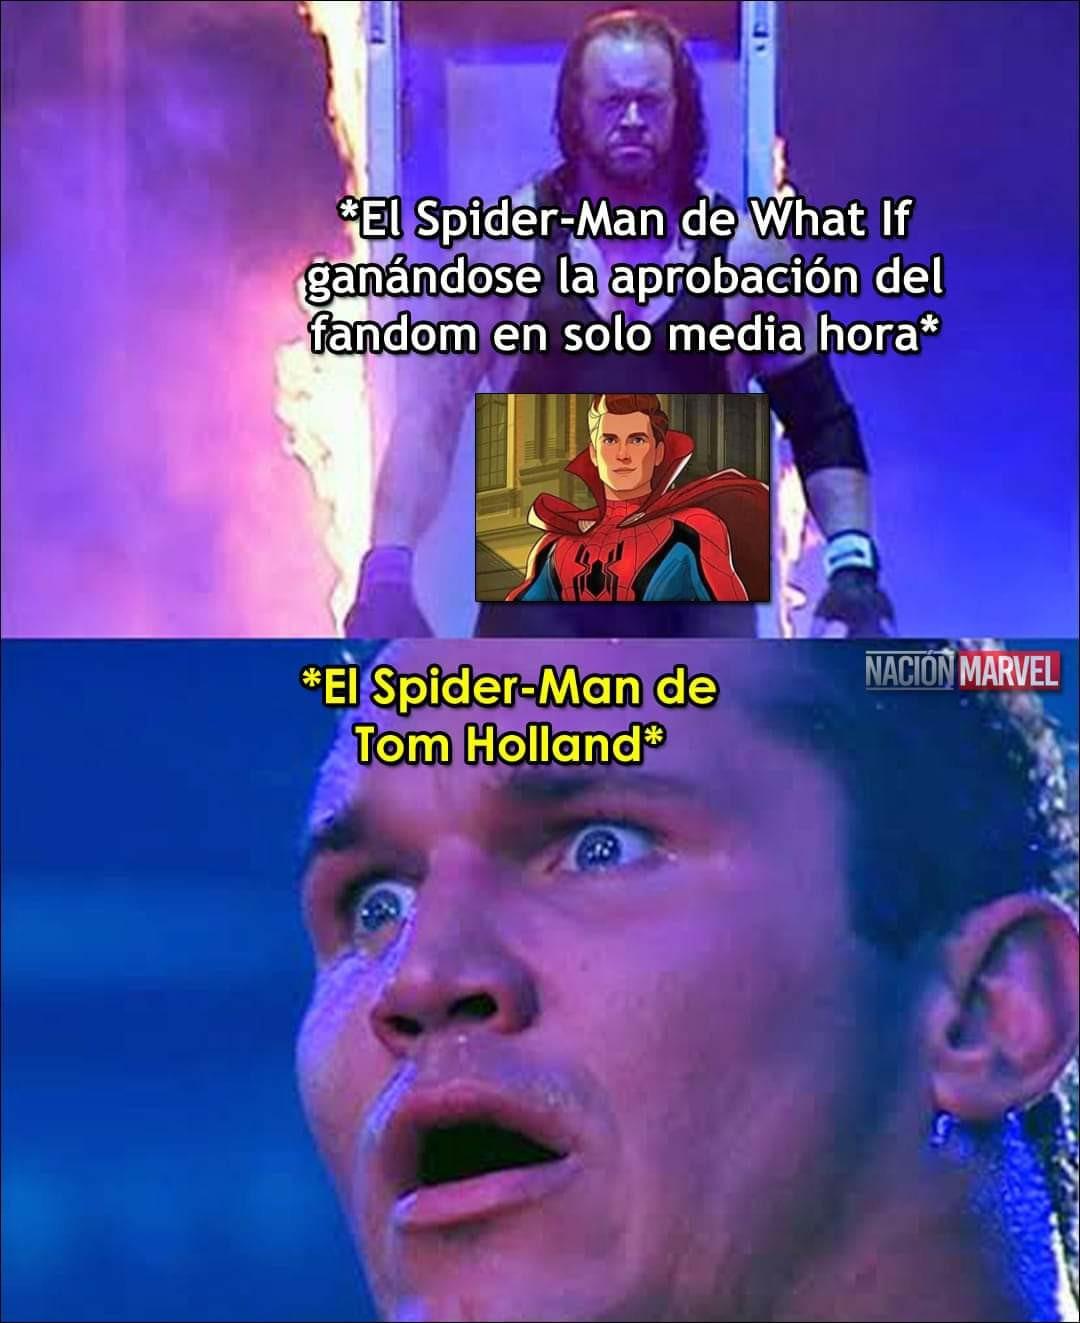 El spiderman de what if le da 10983829383 vueltas al de holland - meme